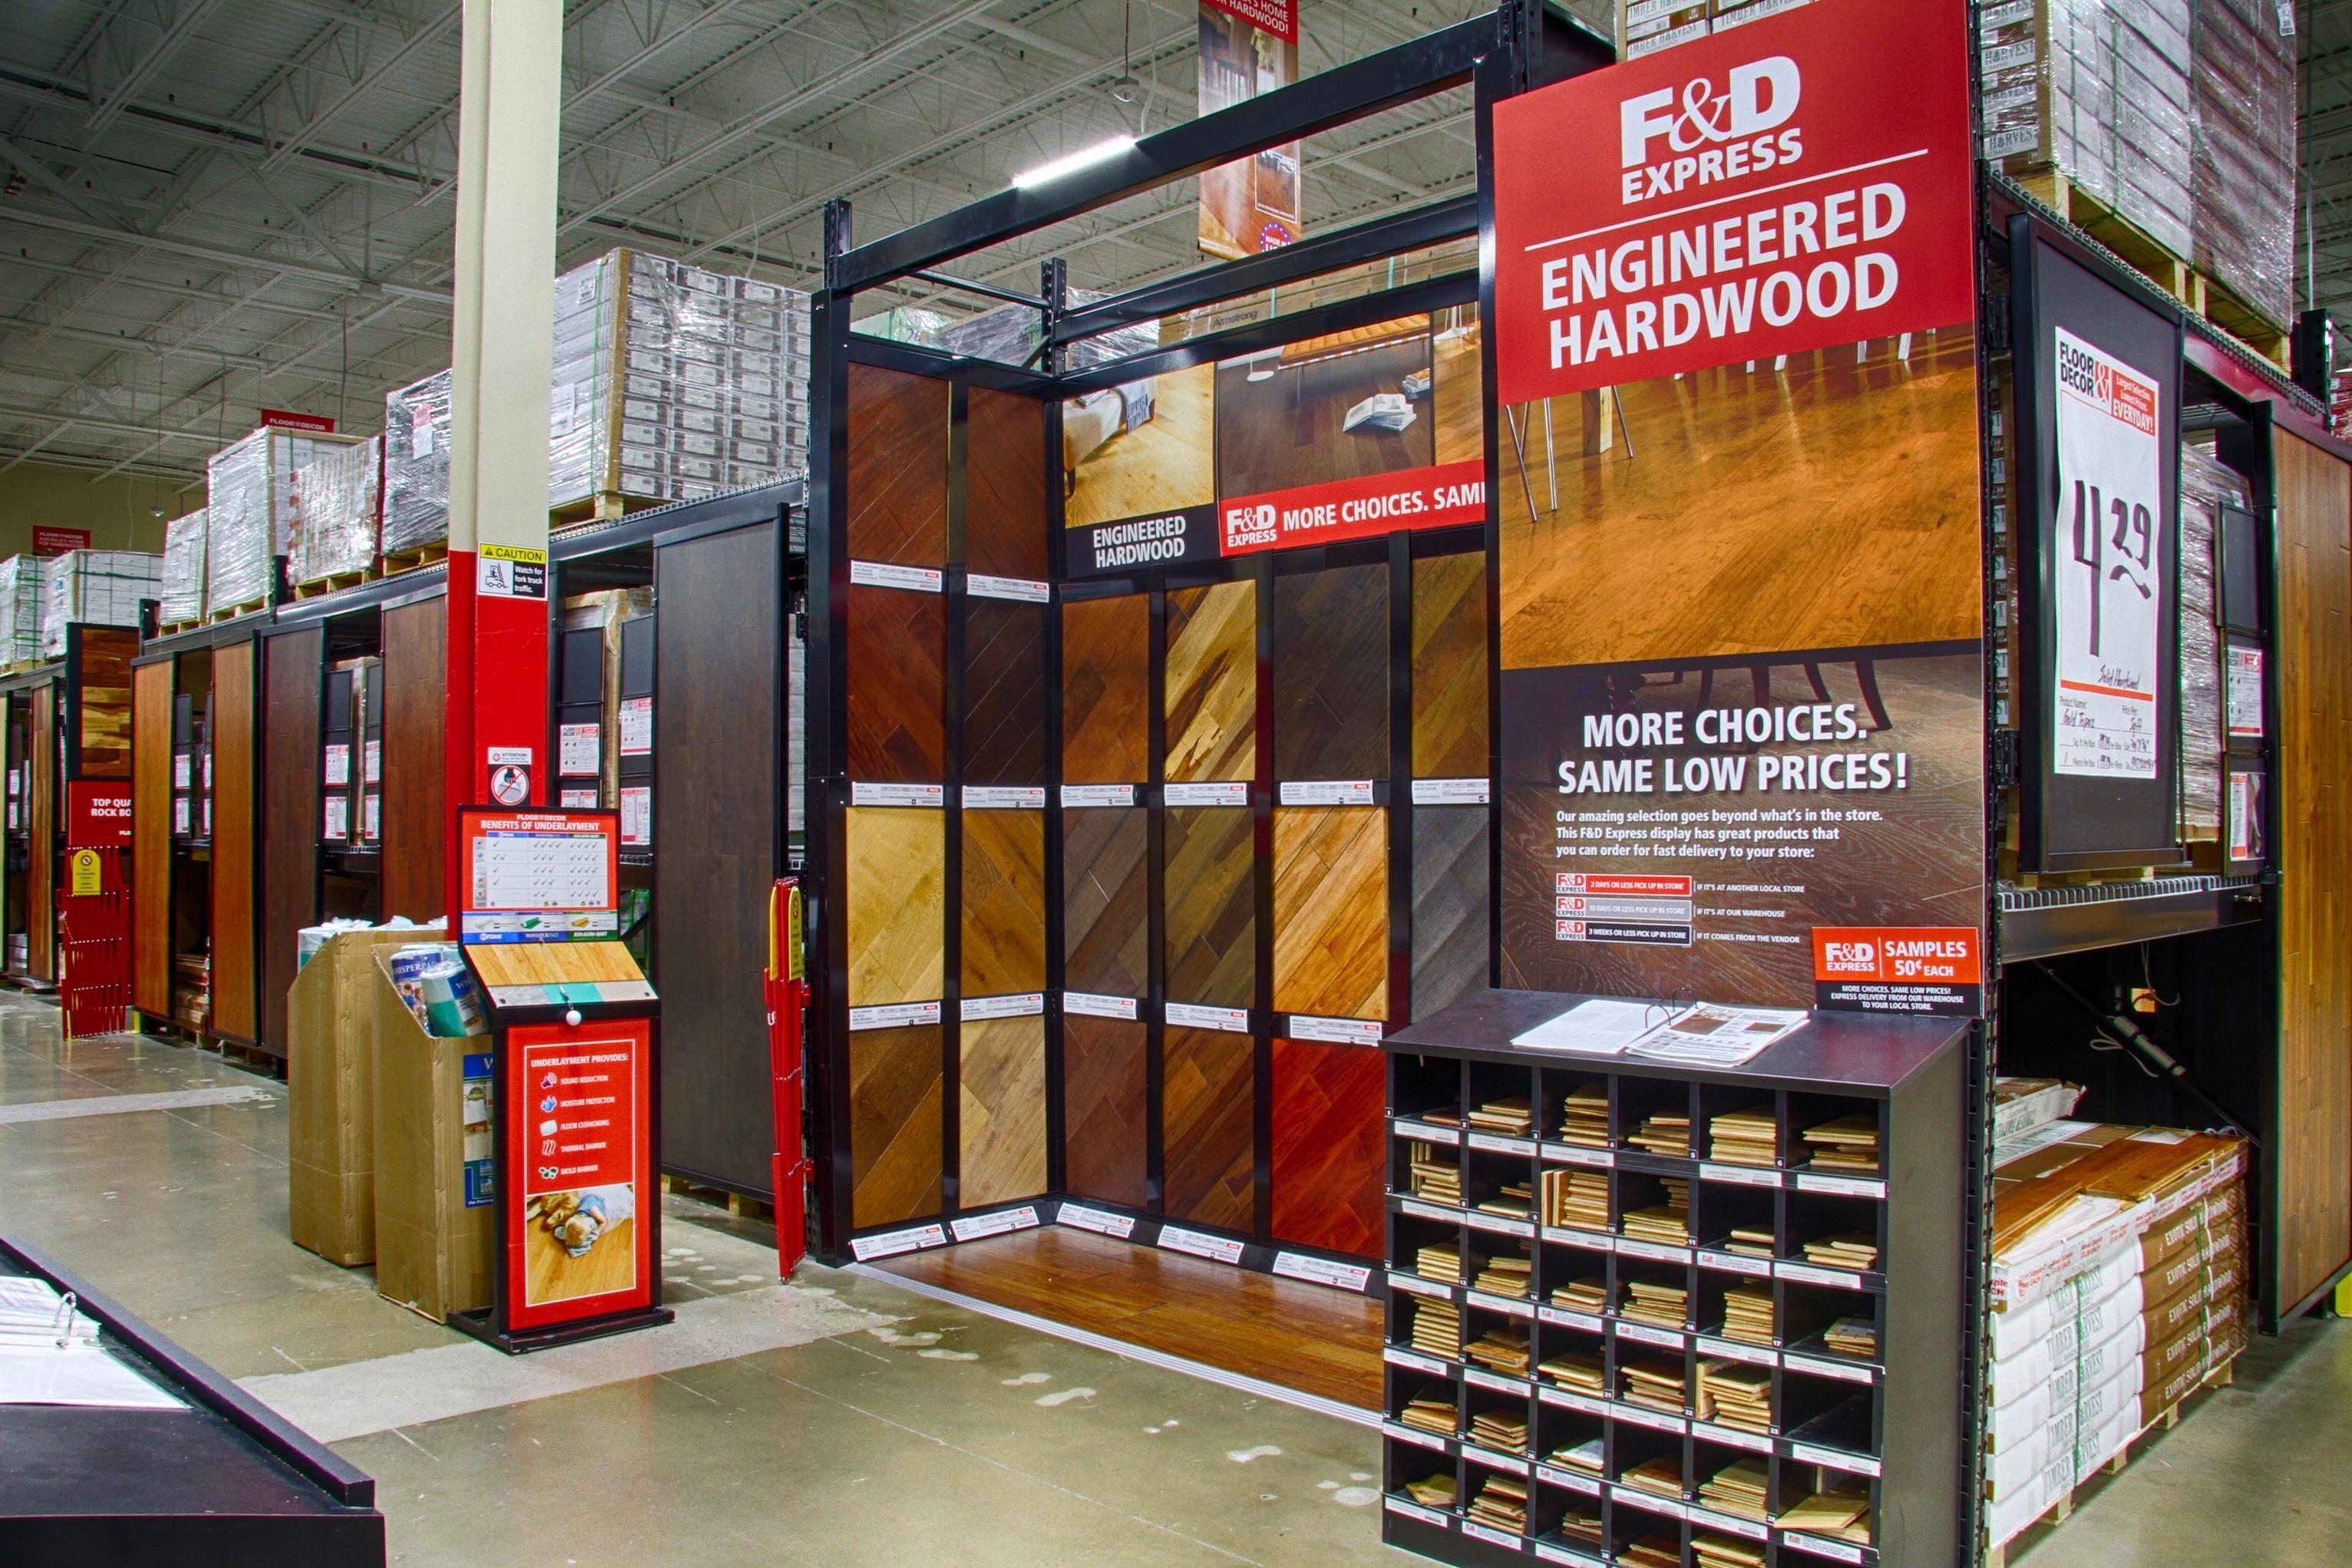 Floor And Decor Woodbridge Va Hours Feels Free To Follow Us In 2020 Flooring Floor Decor Wood Bridge